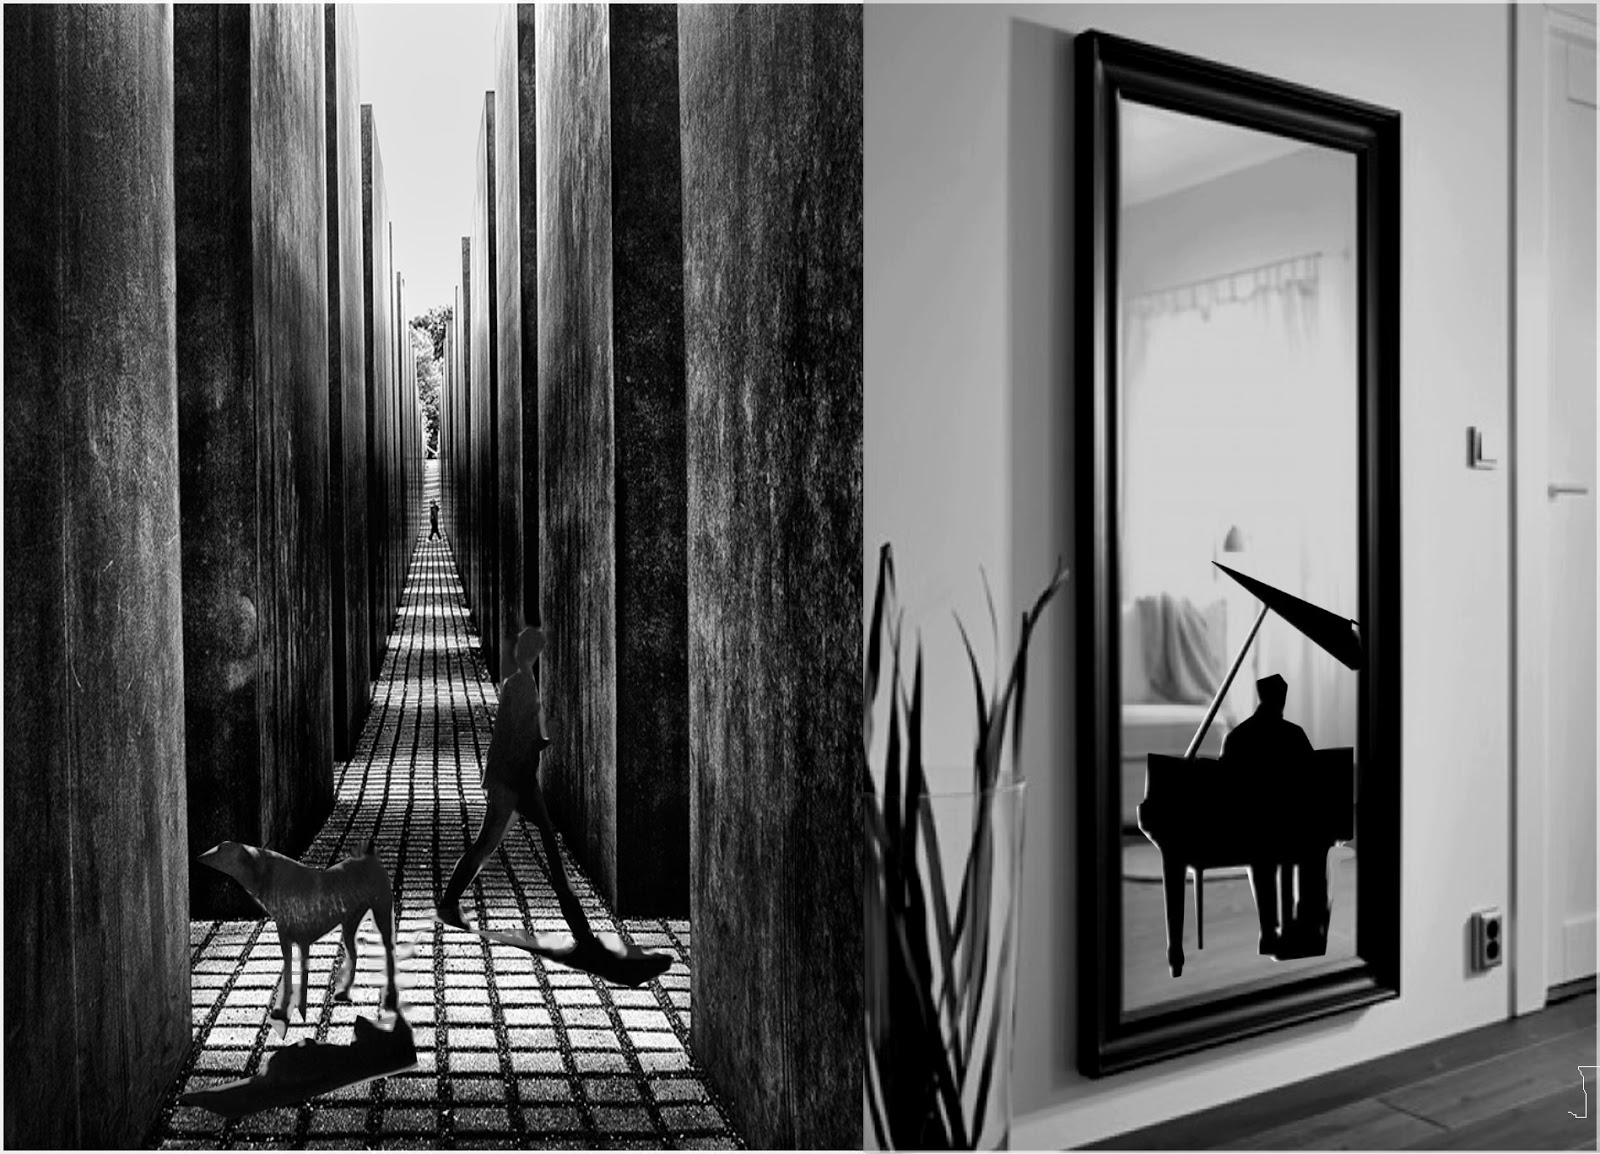 ART POETICA Couvelis: LITTERATURE-ΛΟΓΟΤΕΧΝΙΑ -Ο ΑΝΘΡΩΠΟΣ..